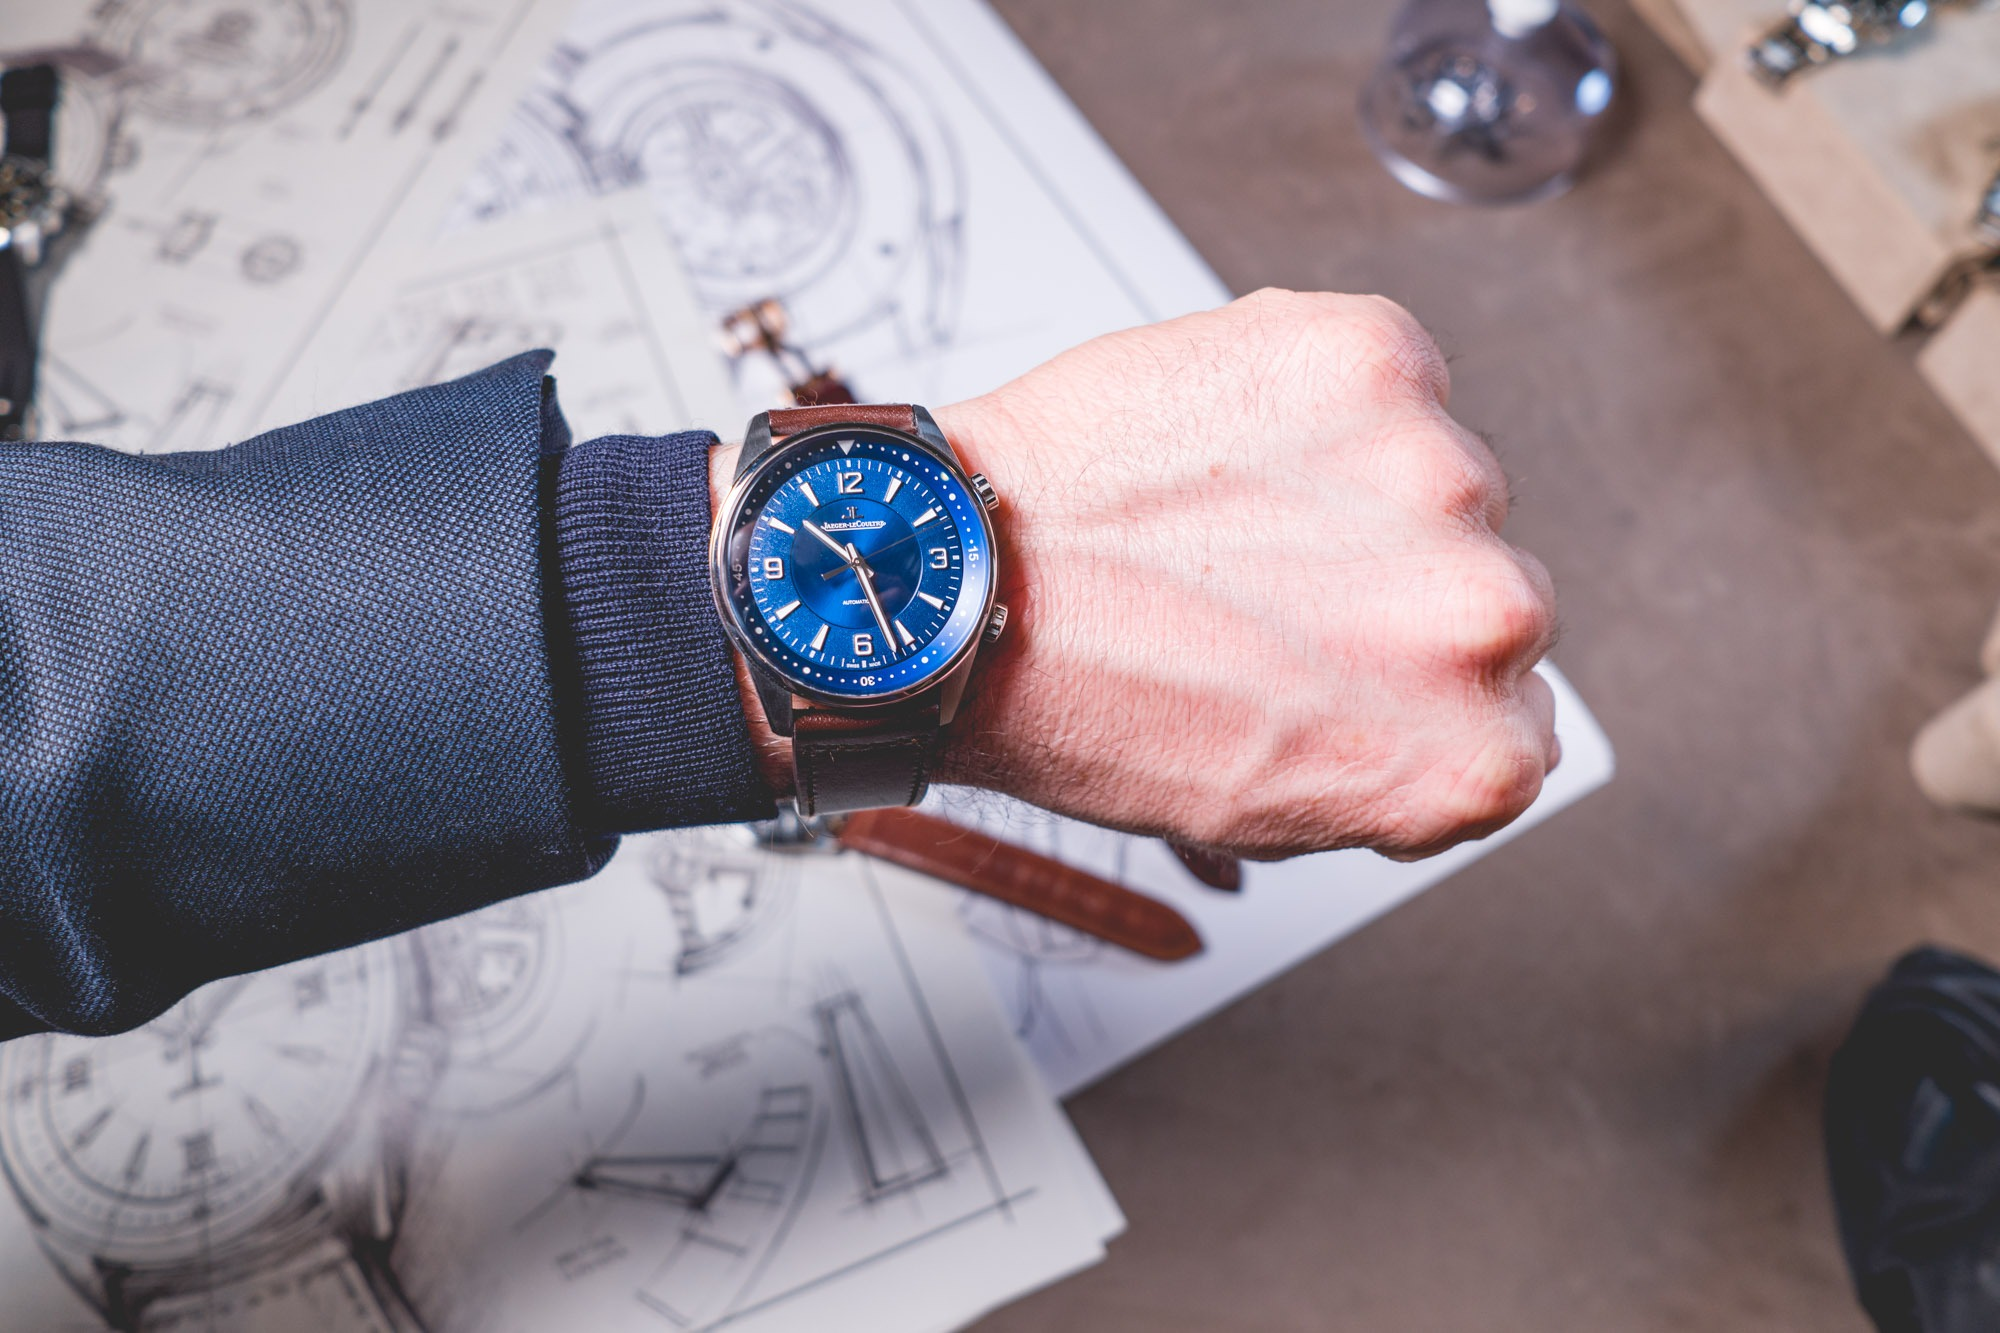 Jaeger Lecoultre - SIHH 2018 - Polaris Date Cadran bleu - porté